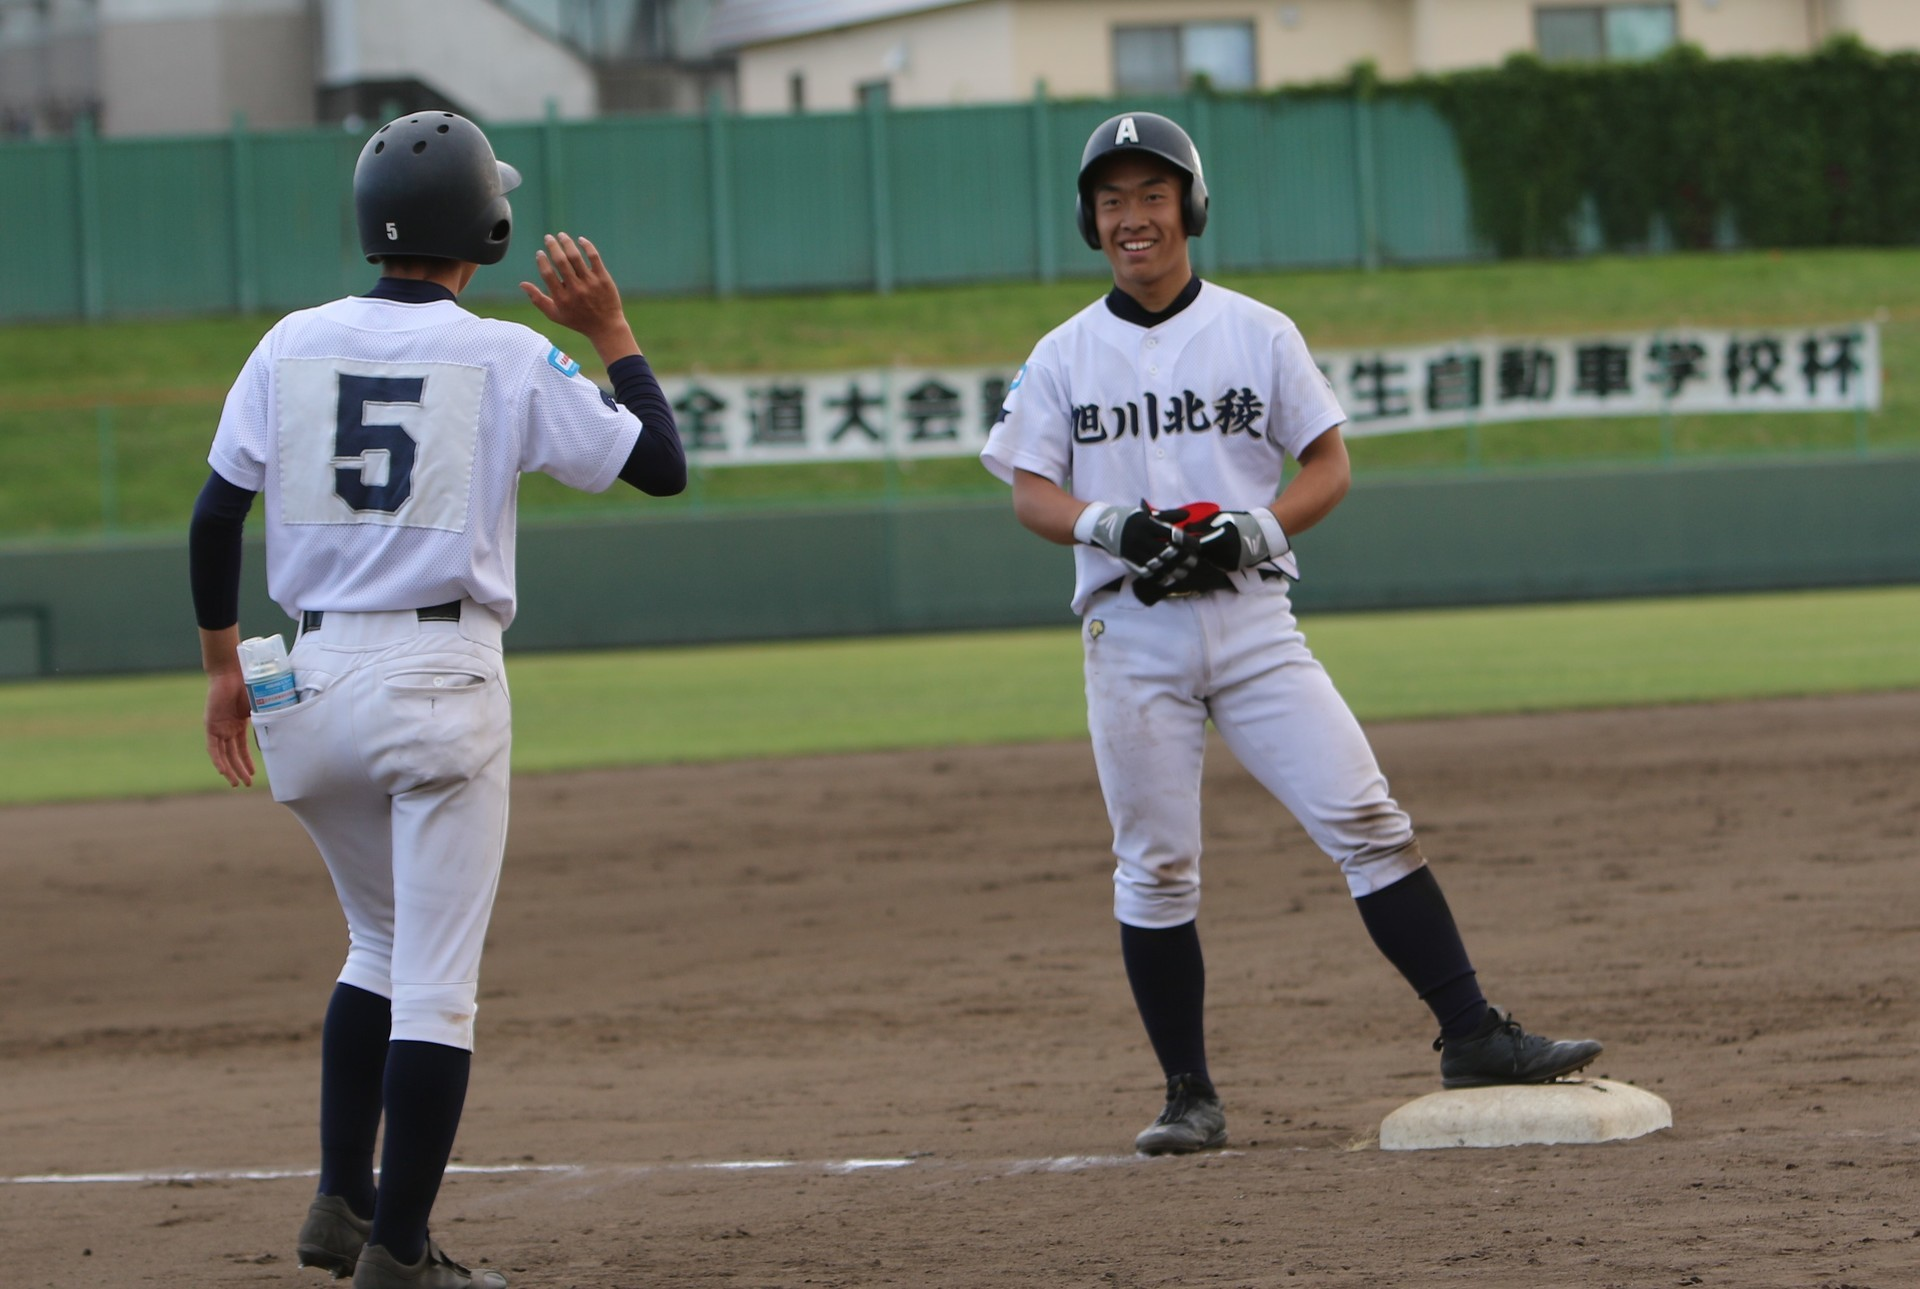 秋季道大会リーグ戦より=23日、札幌麻生球場 (16).jpg